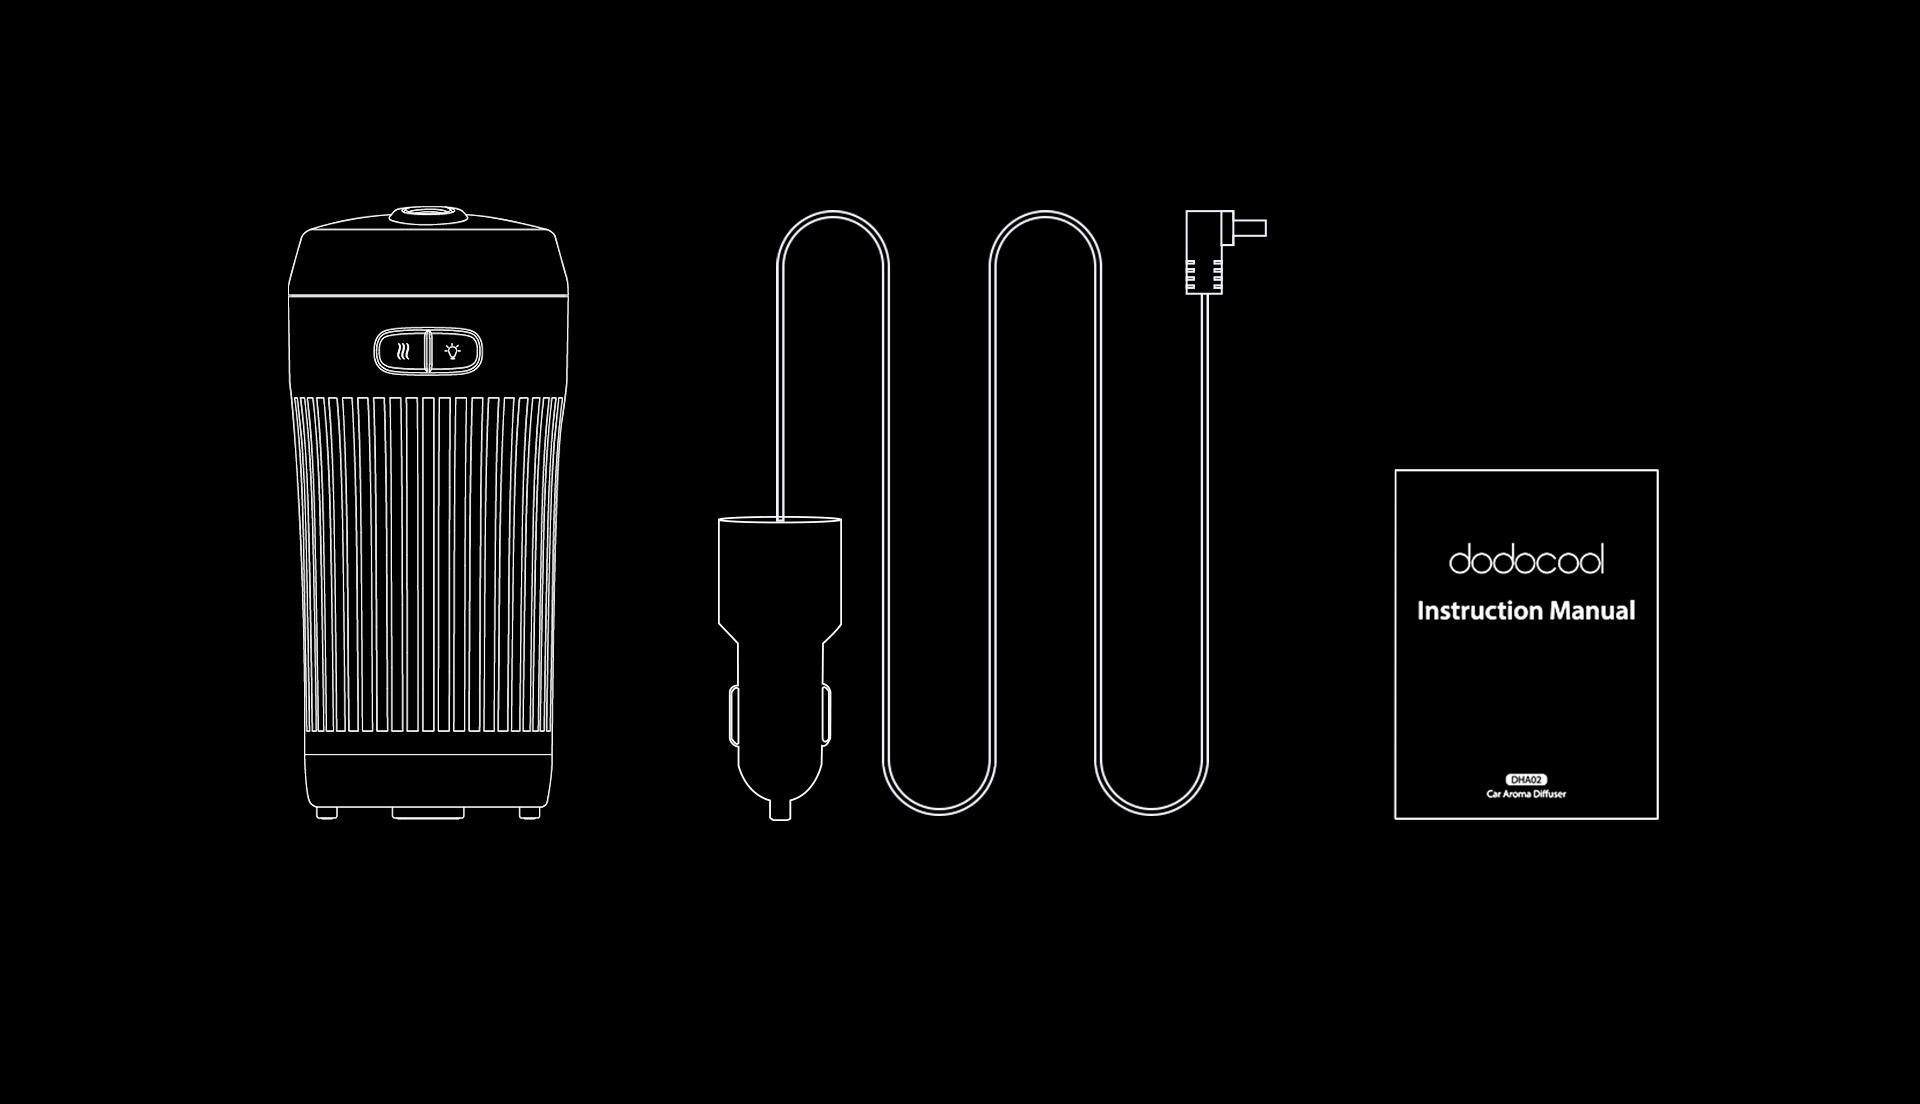 Dodocool Mini Portable 70ml Ultrasonic Car Aroma Essential Oil Diffuser H3g0 Humidifiers Home Furniture Diy Plastpath Com Br